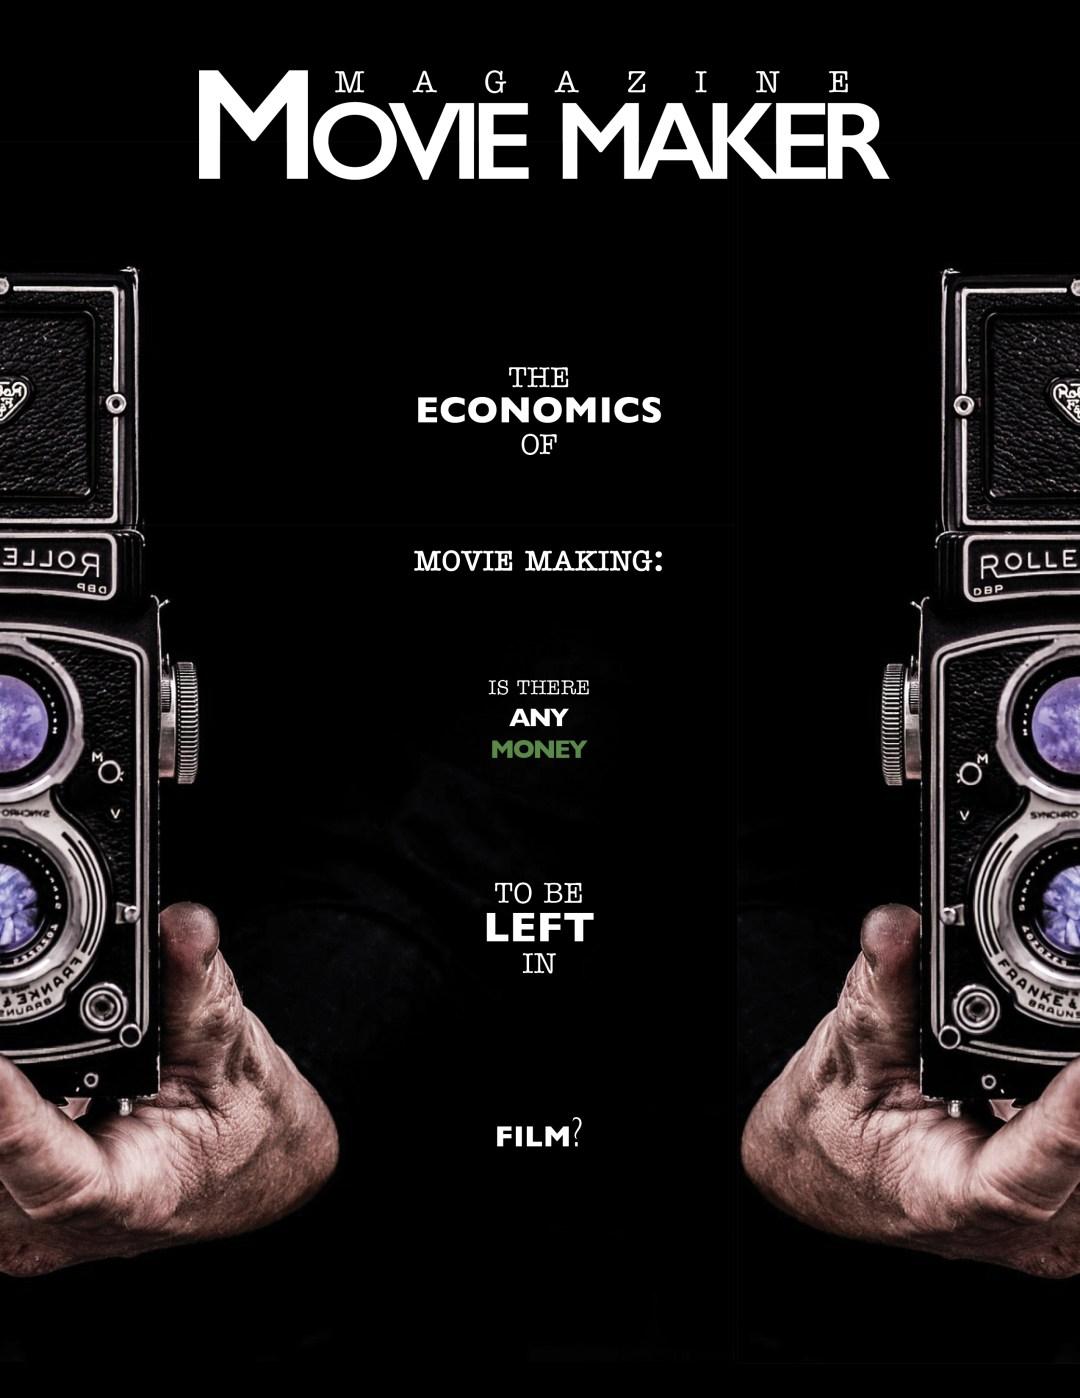 Movie Maker Magazine – Redesign